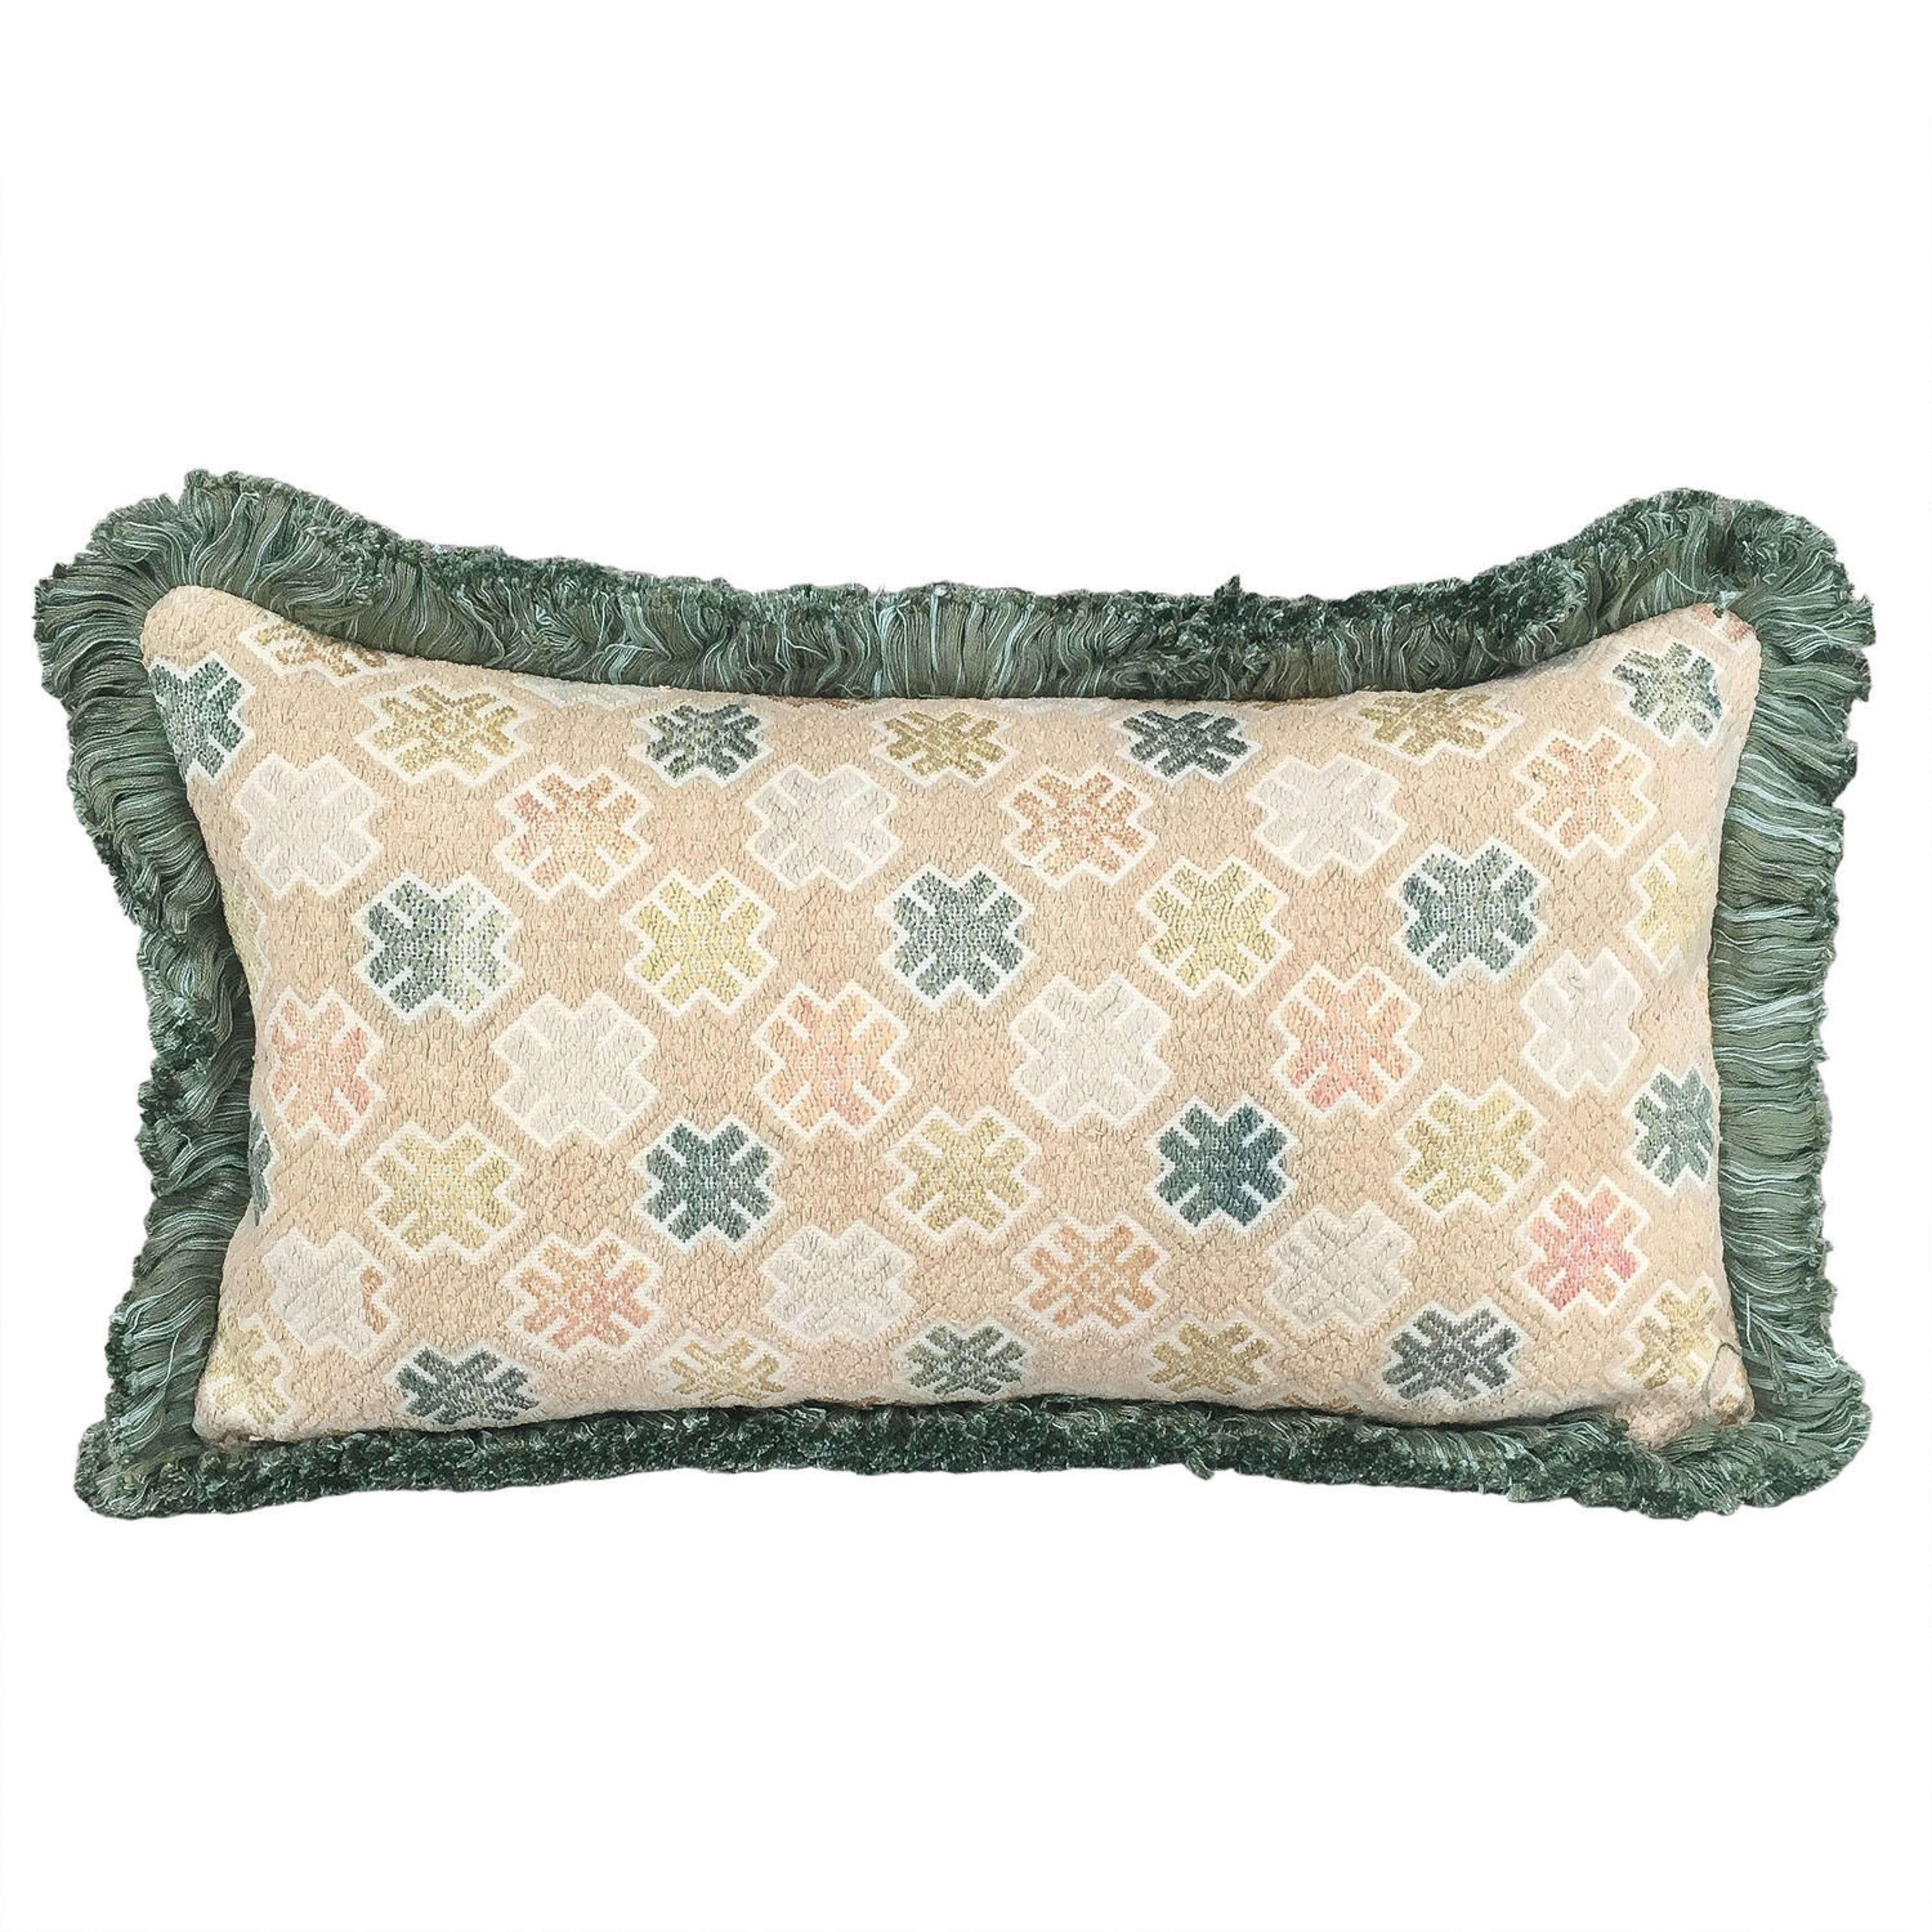 Zhuang Cushion with Green Fringe Trim